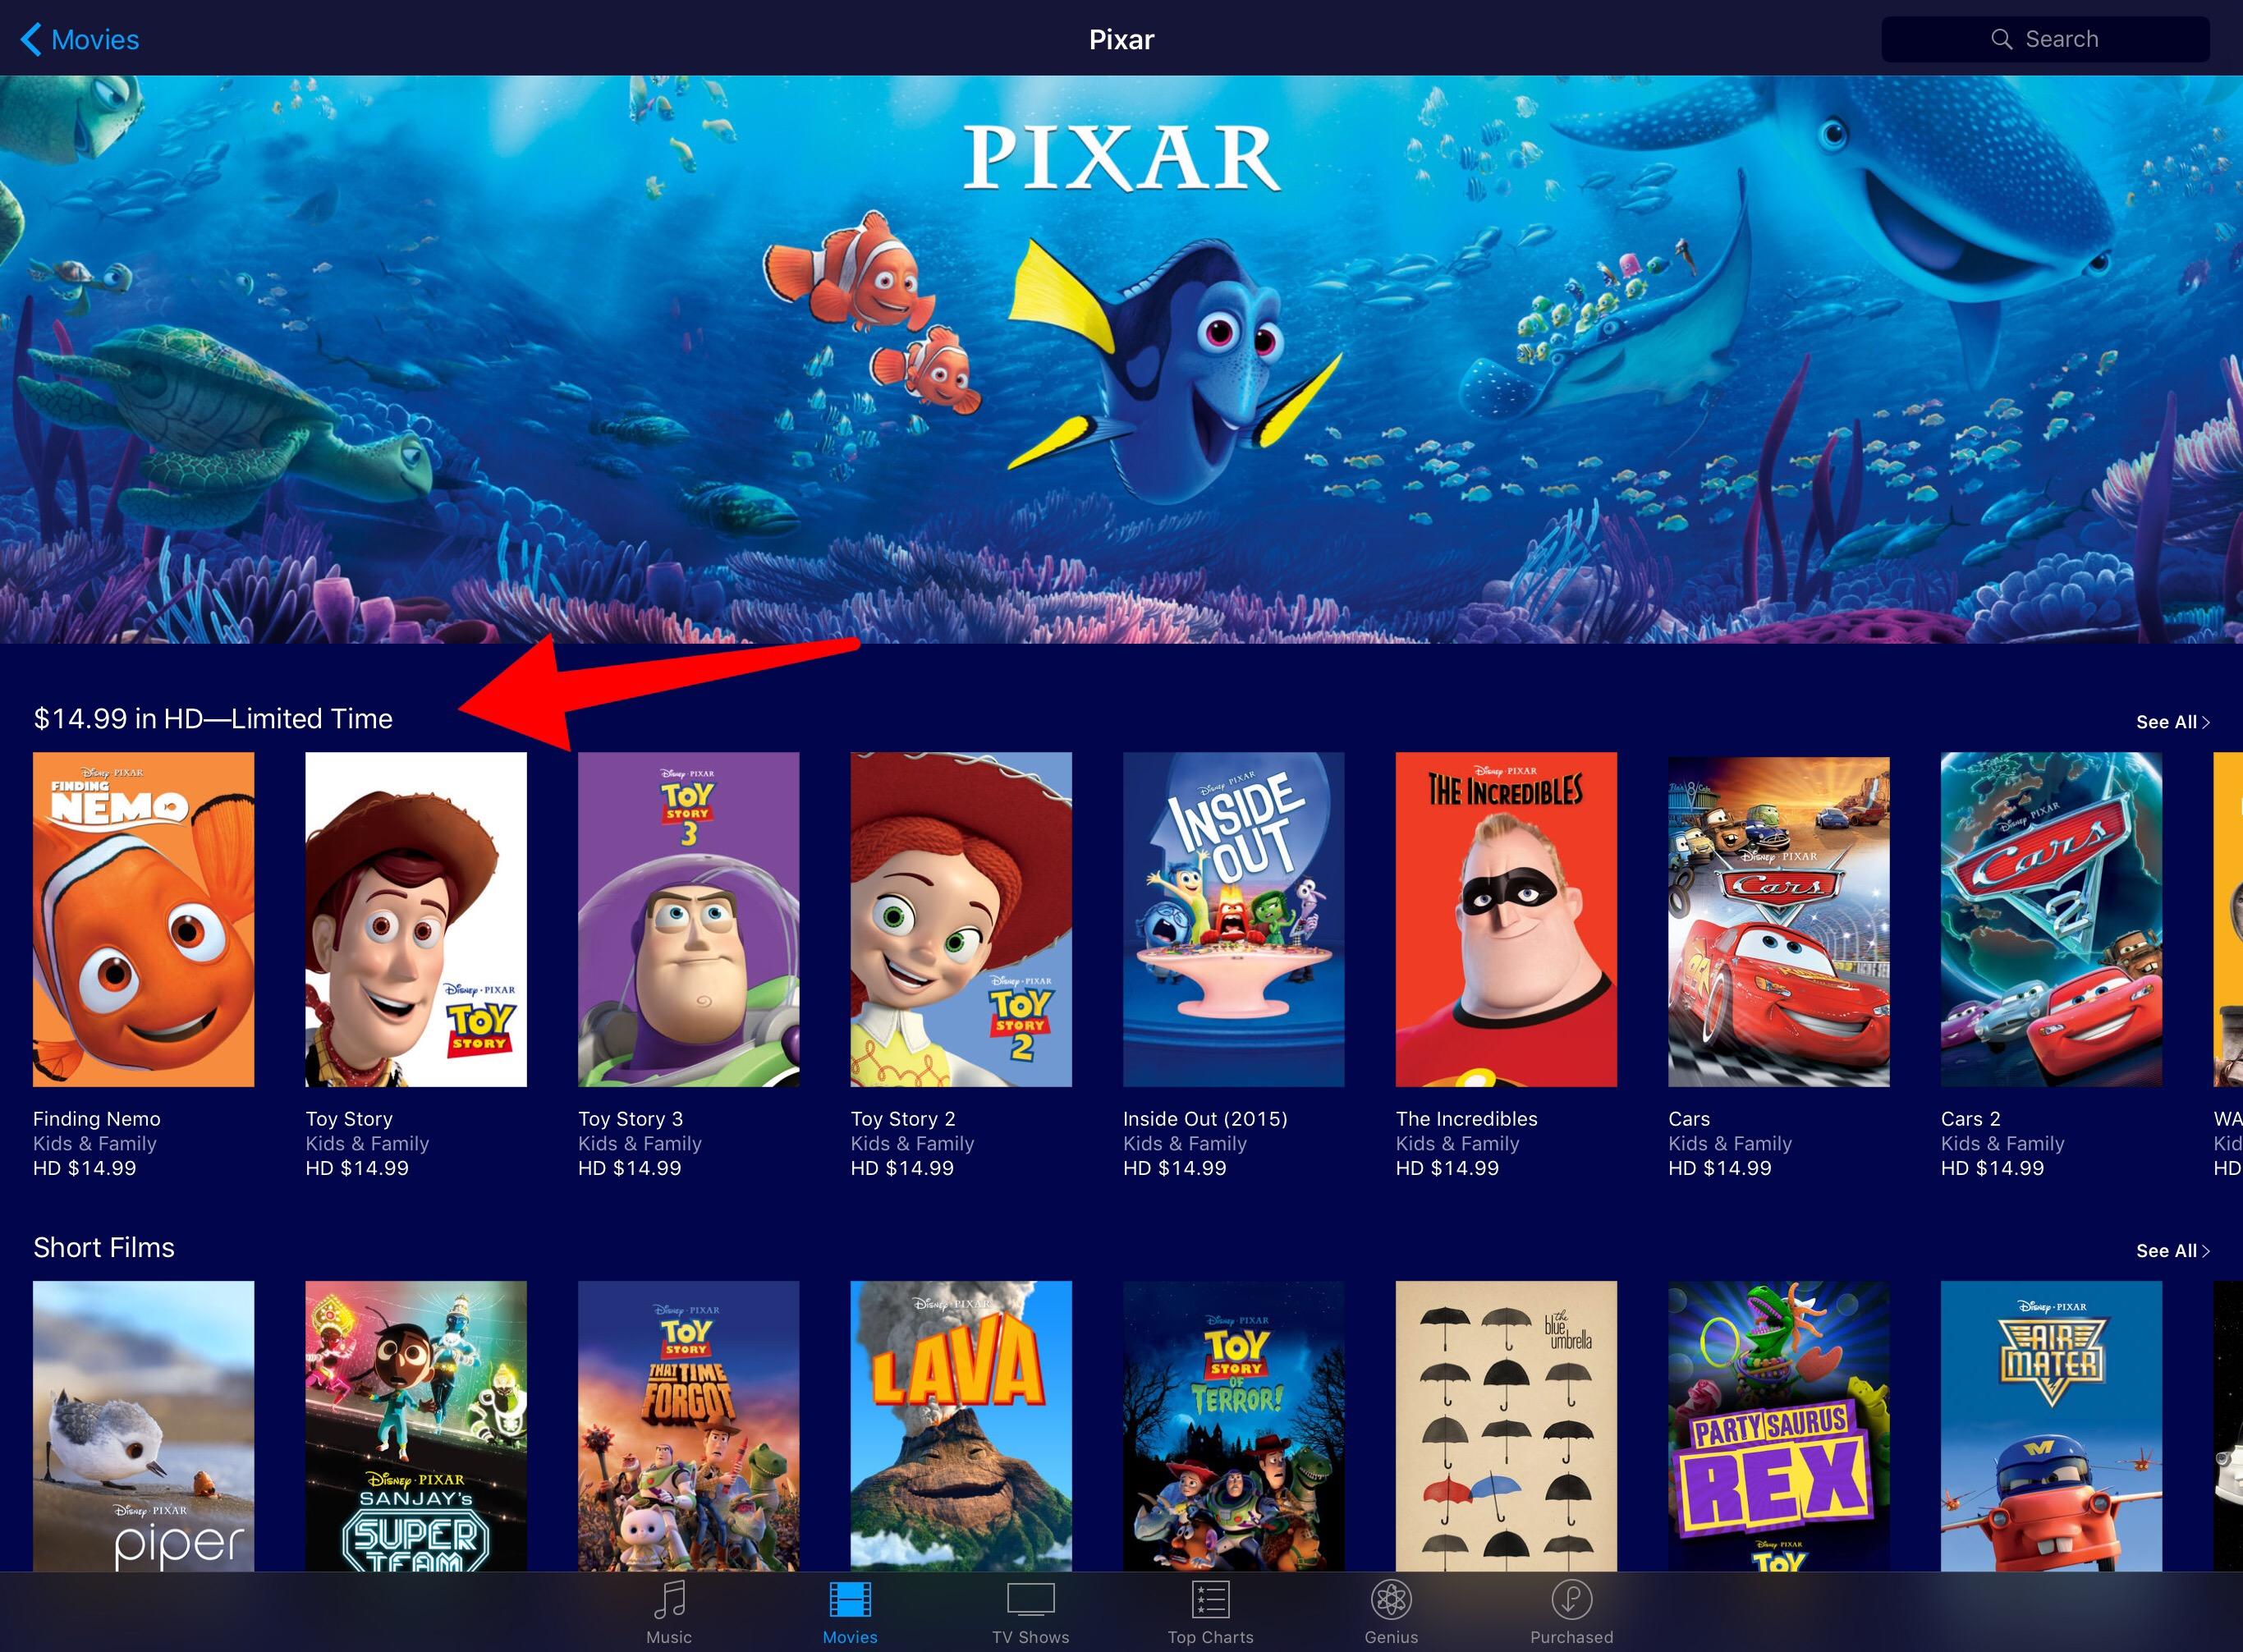 movies All pixar